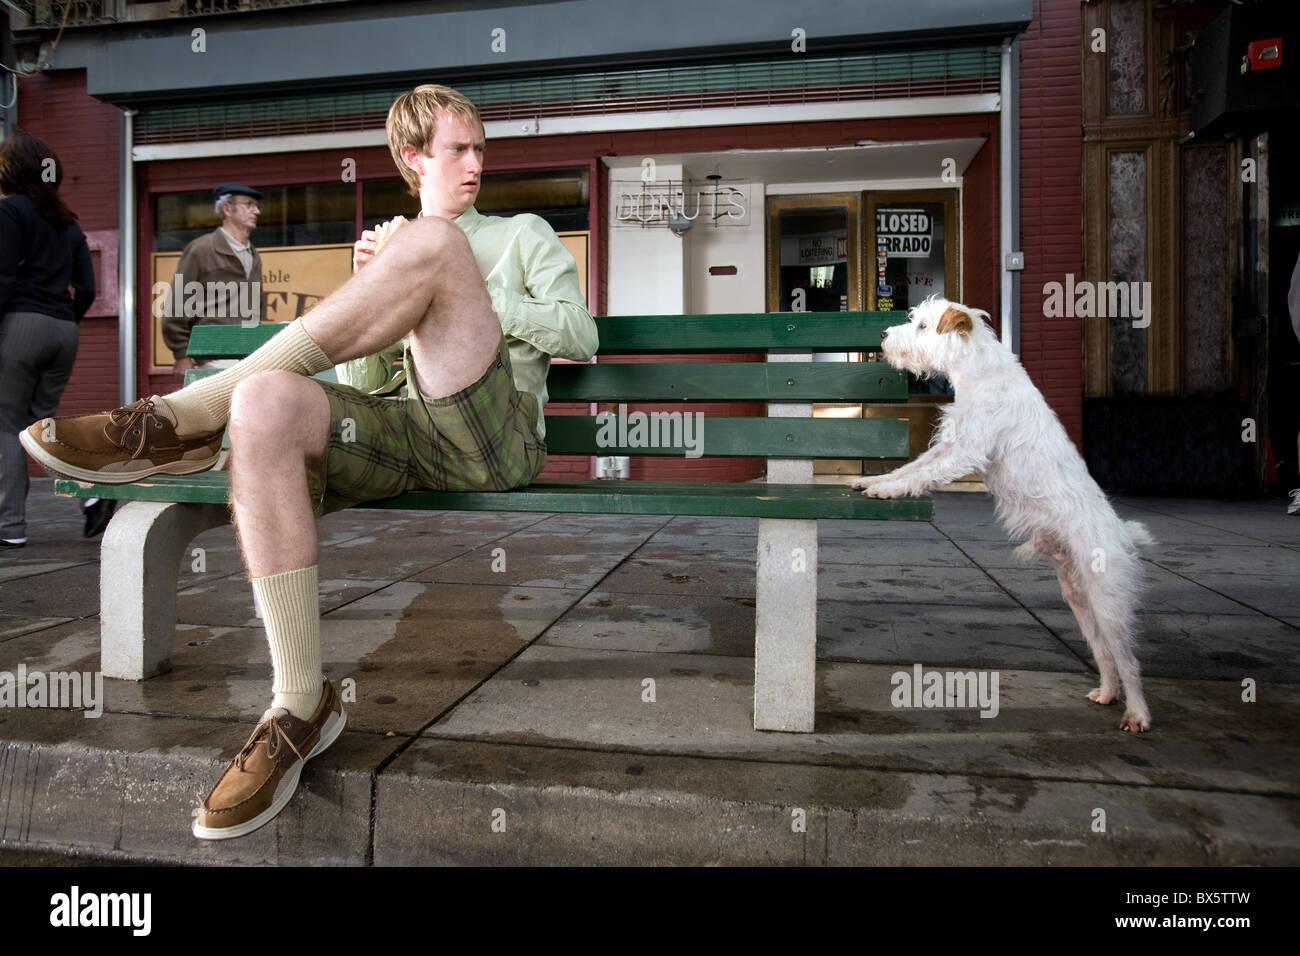 JEREMY HOWARD & FRIDAY HOTEL FOR DOGS (2009 Stock Photo ...